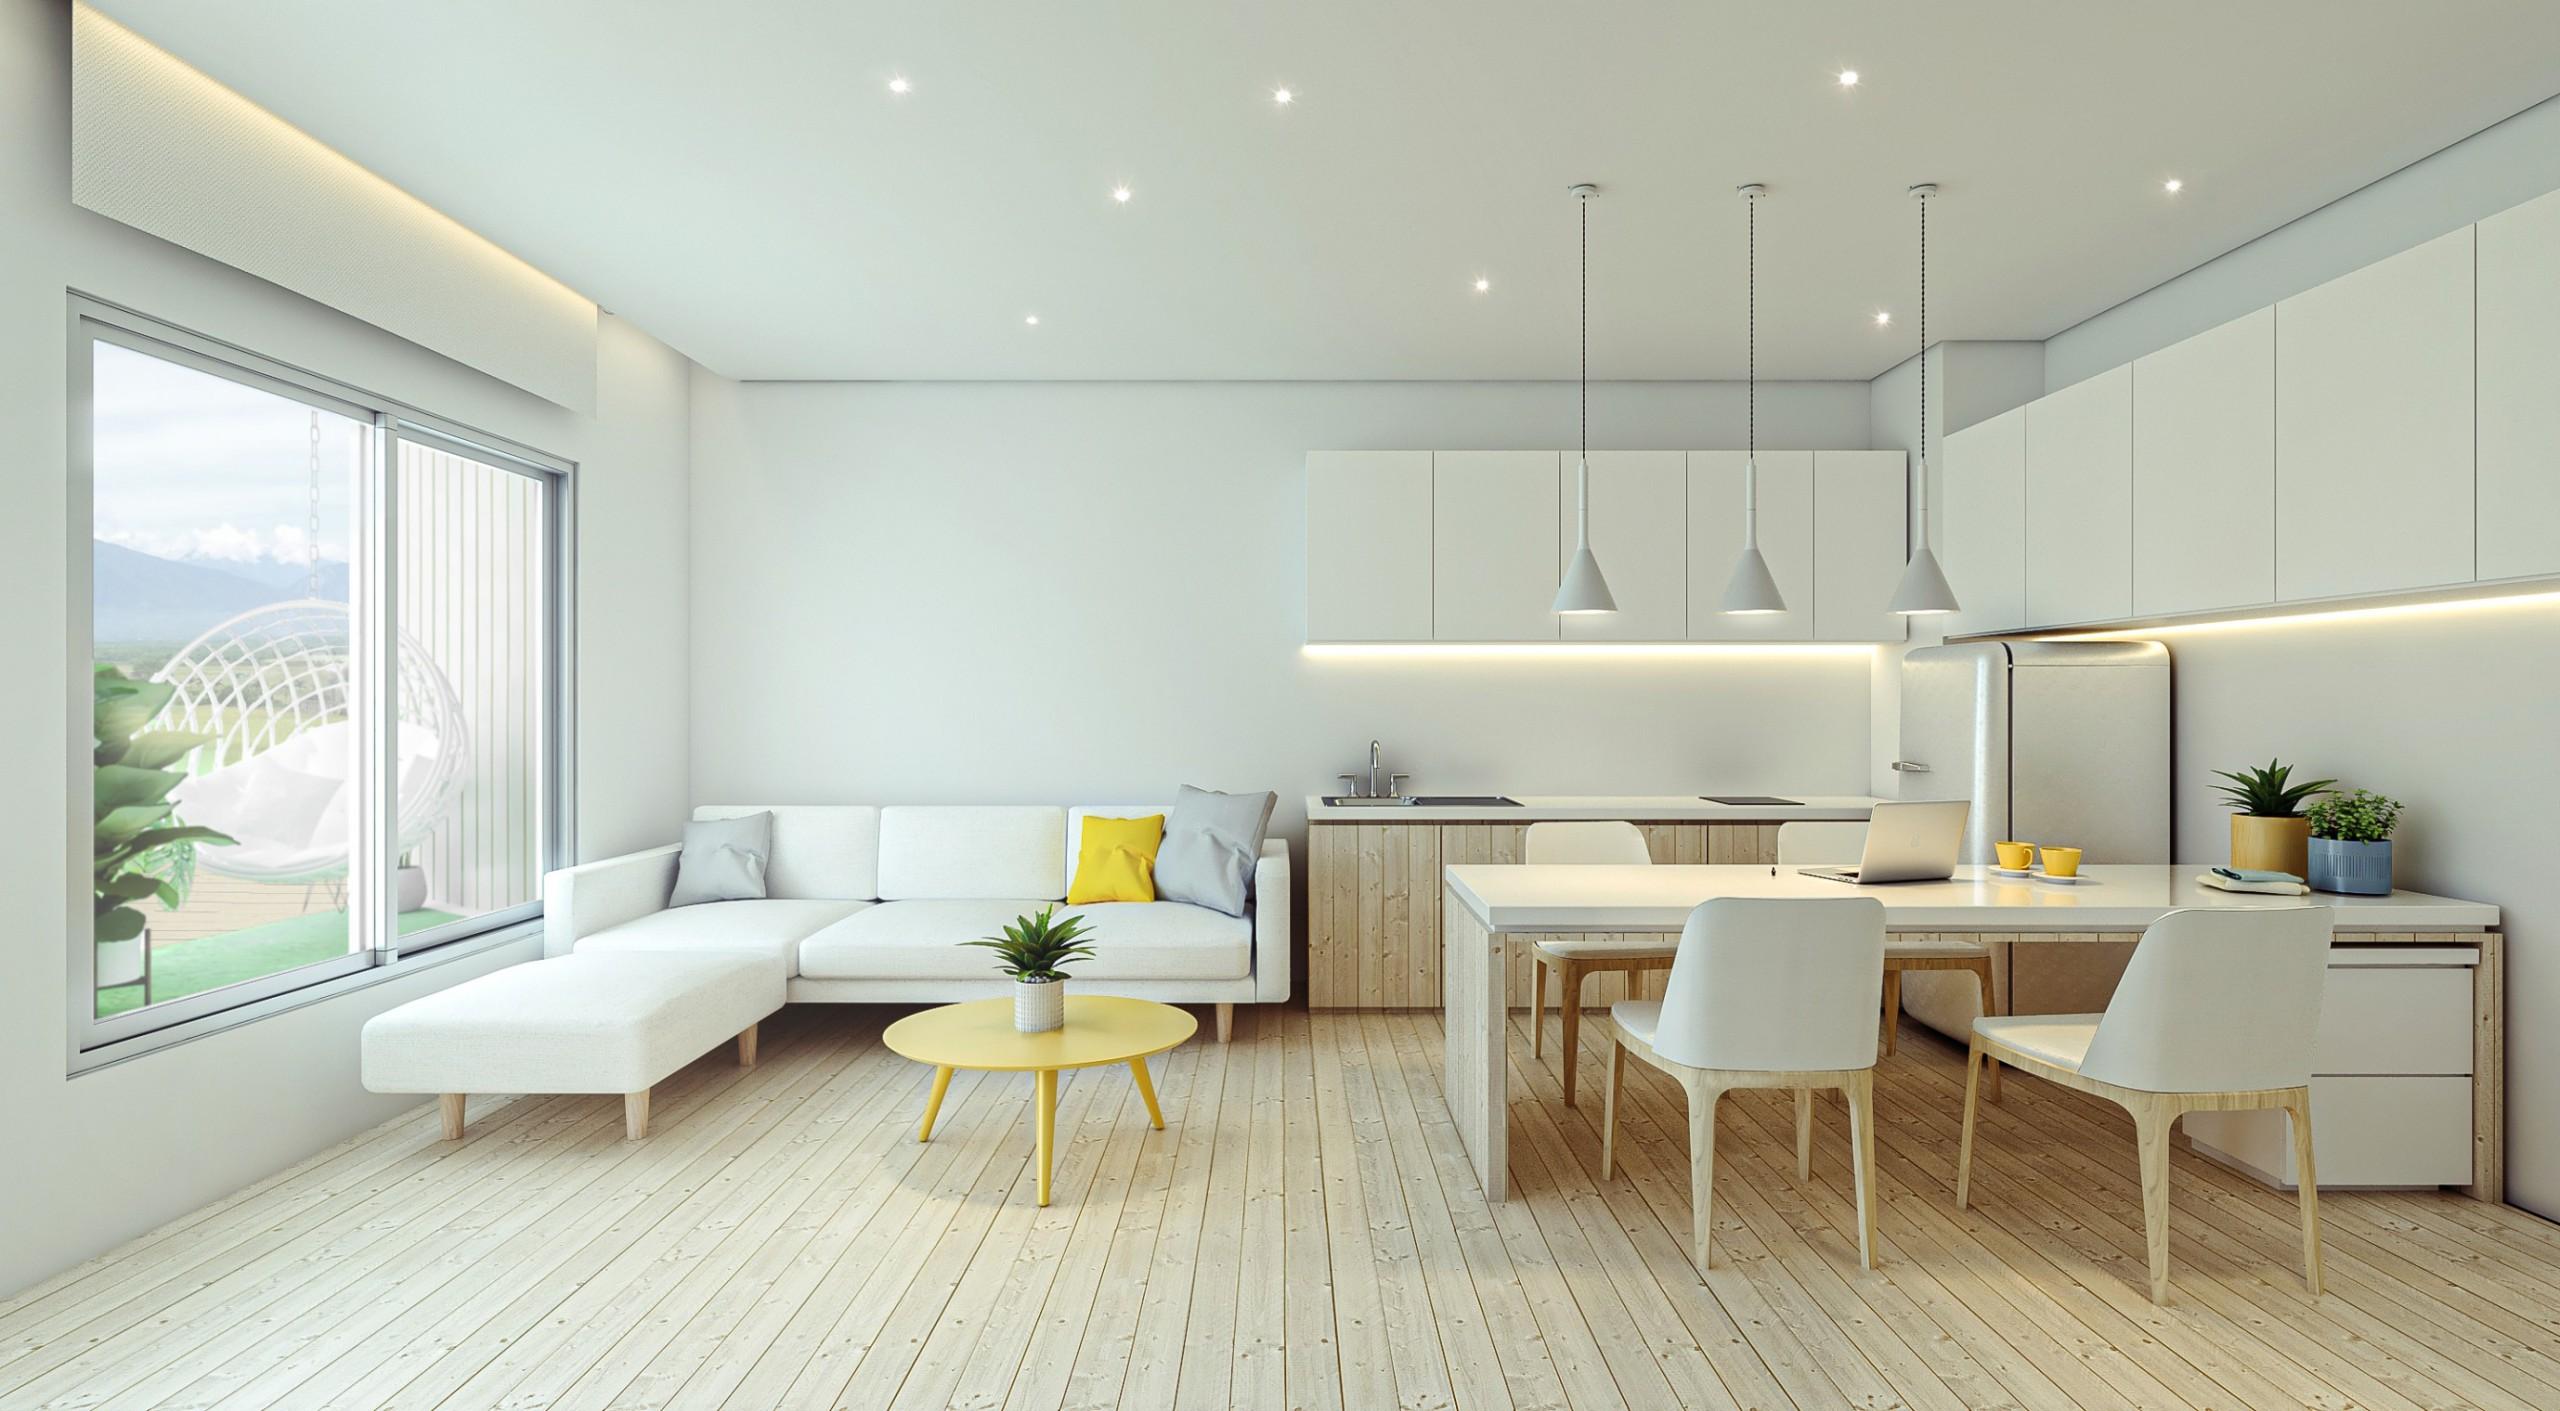 德築-DEZU-project-Zuxing-architecture-build-rendering-3